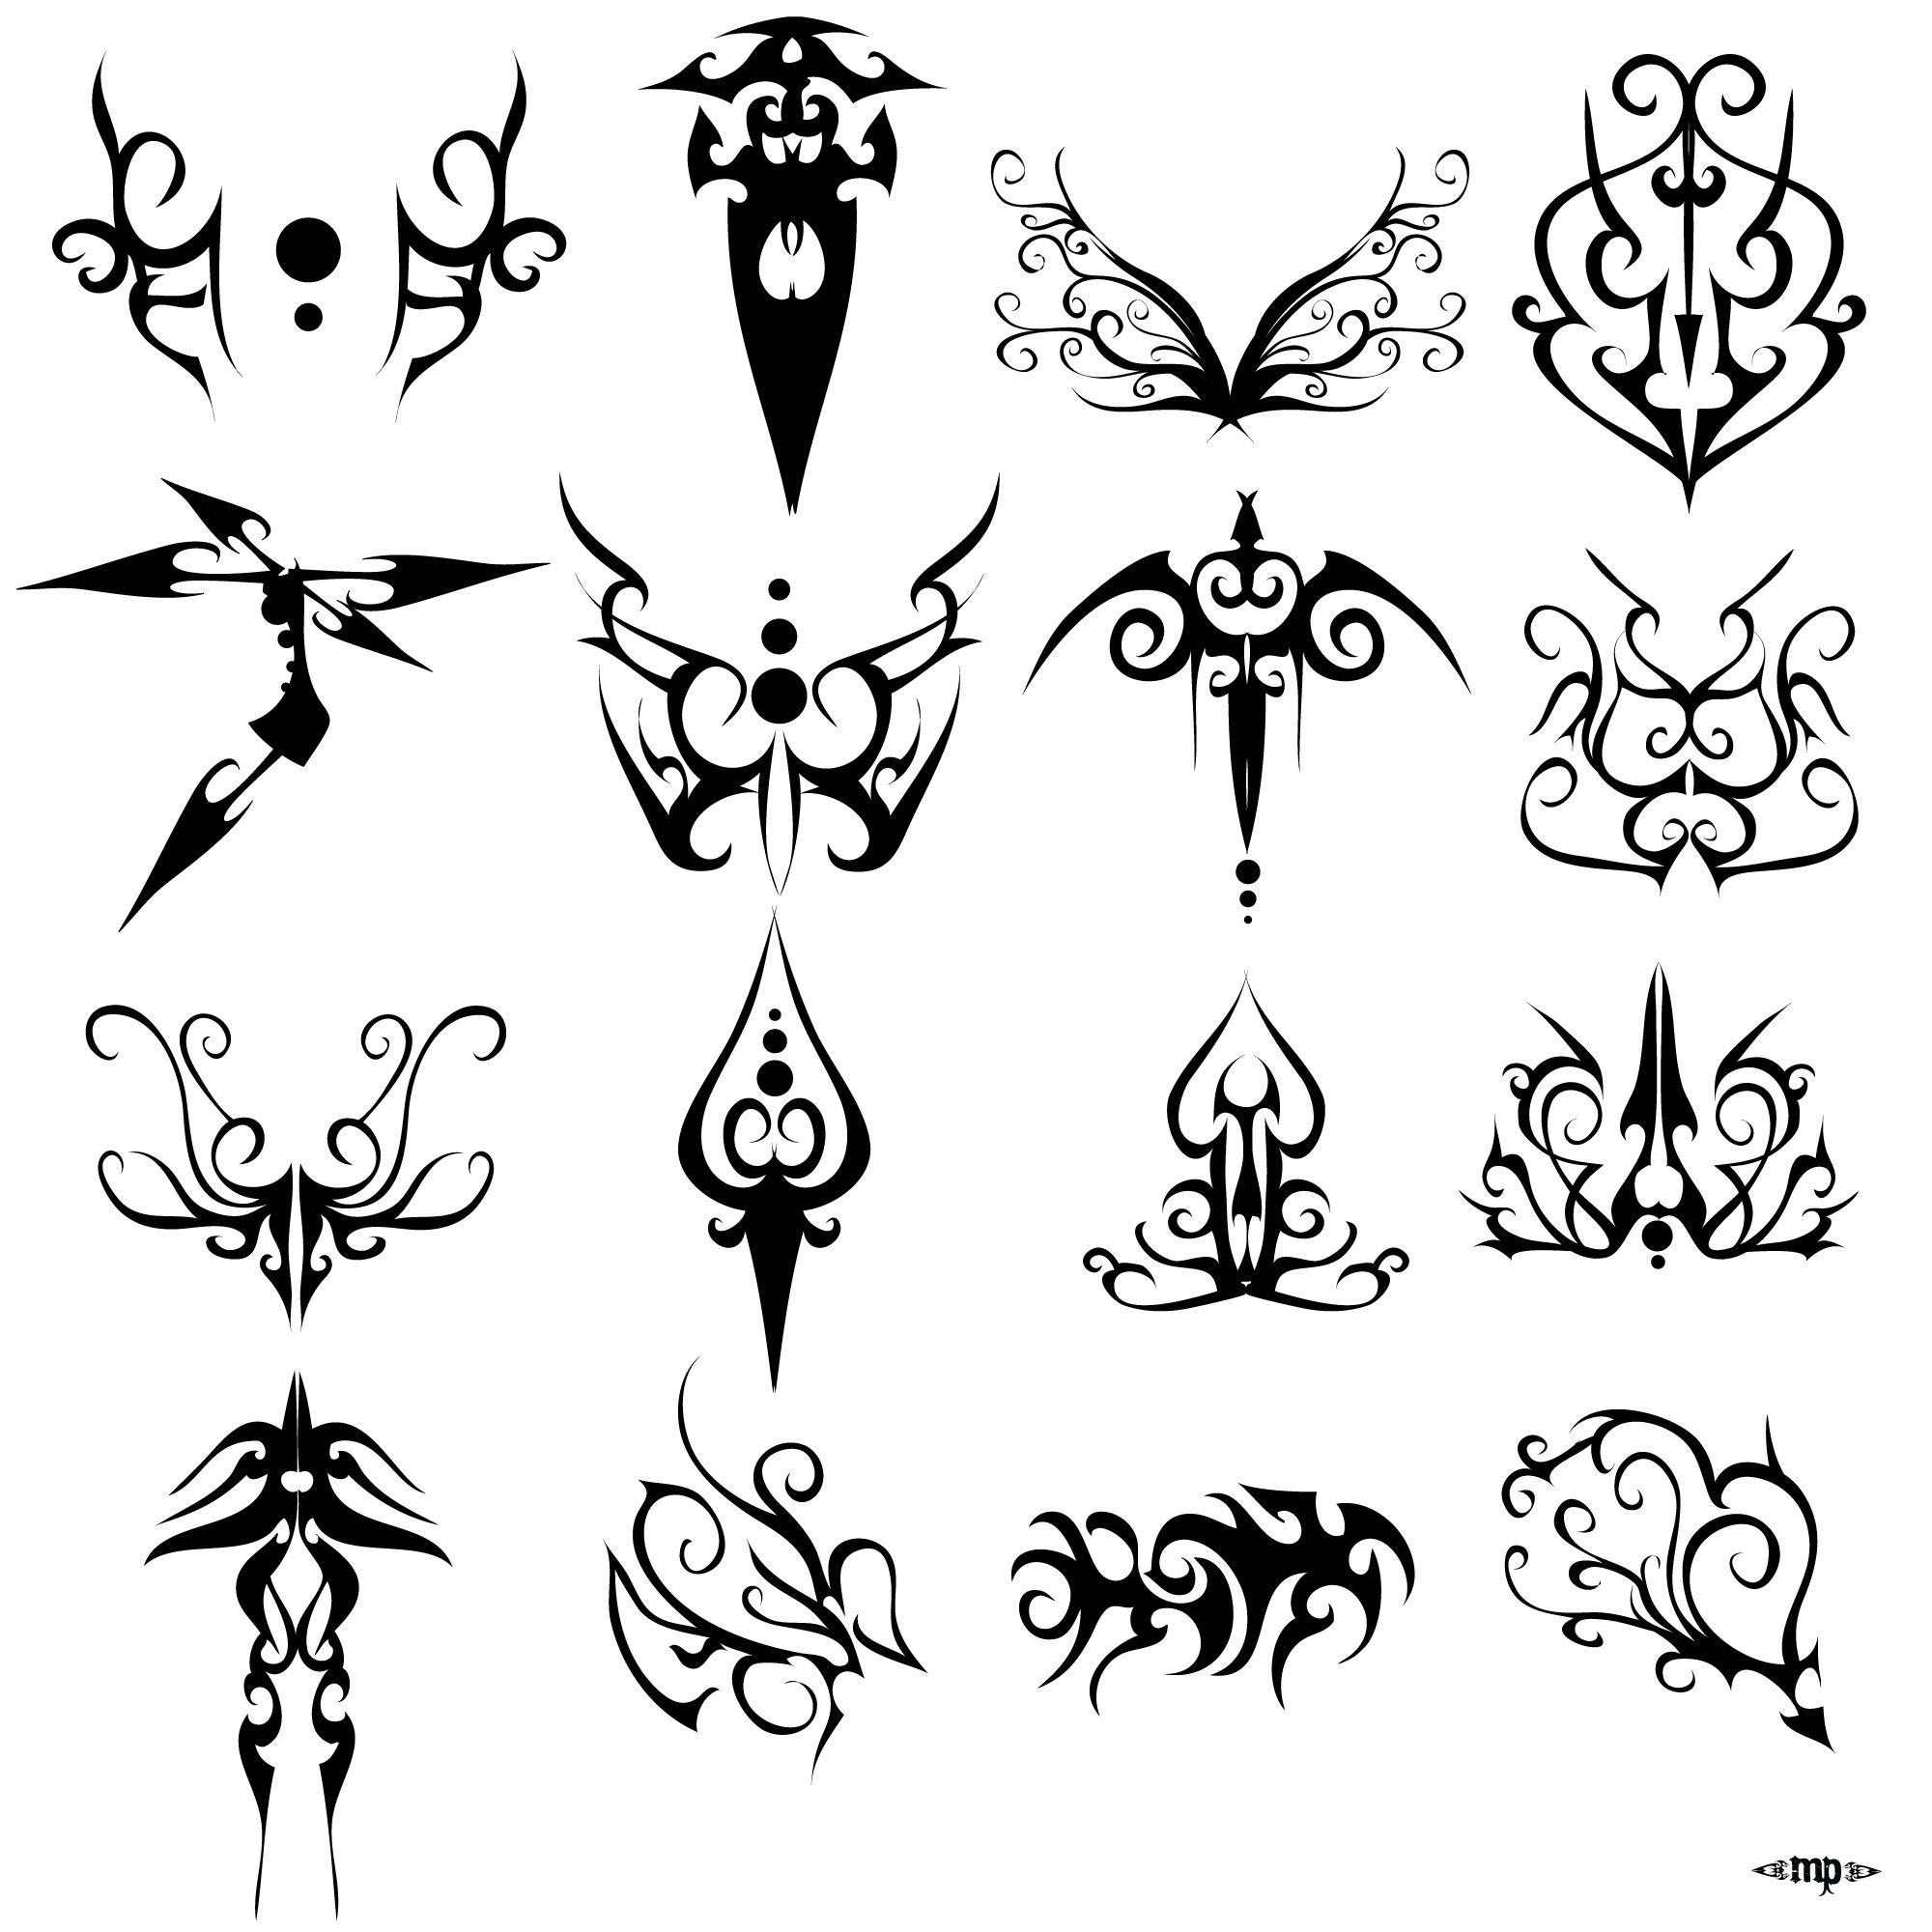 Some Tattoo Design Again Free Tattoo Designs Simple Tattoo Designs Tattoo Stencils